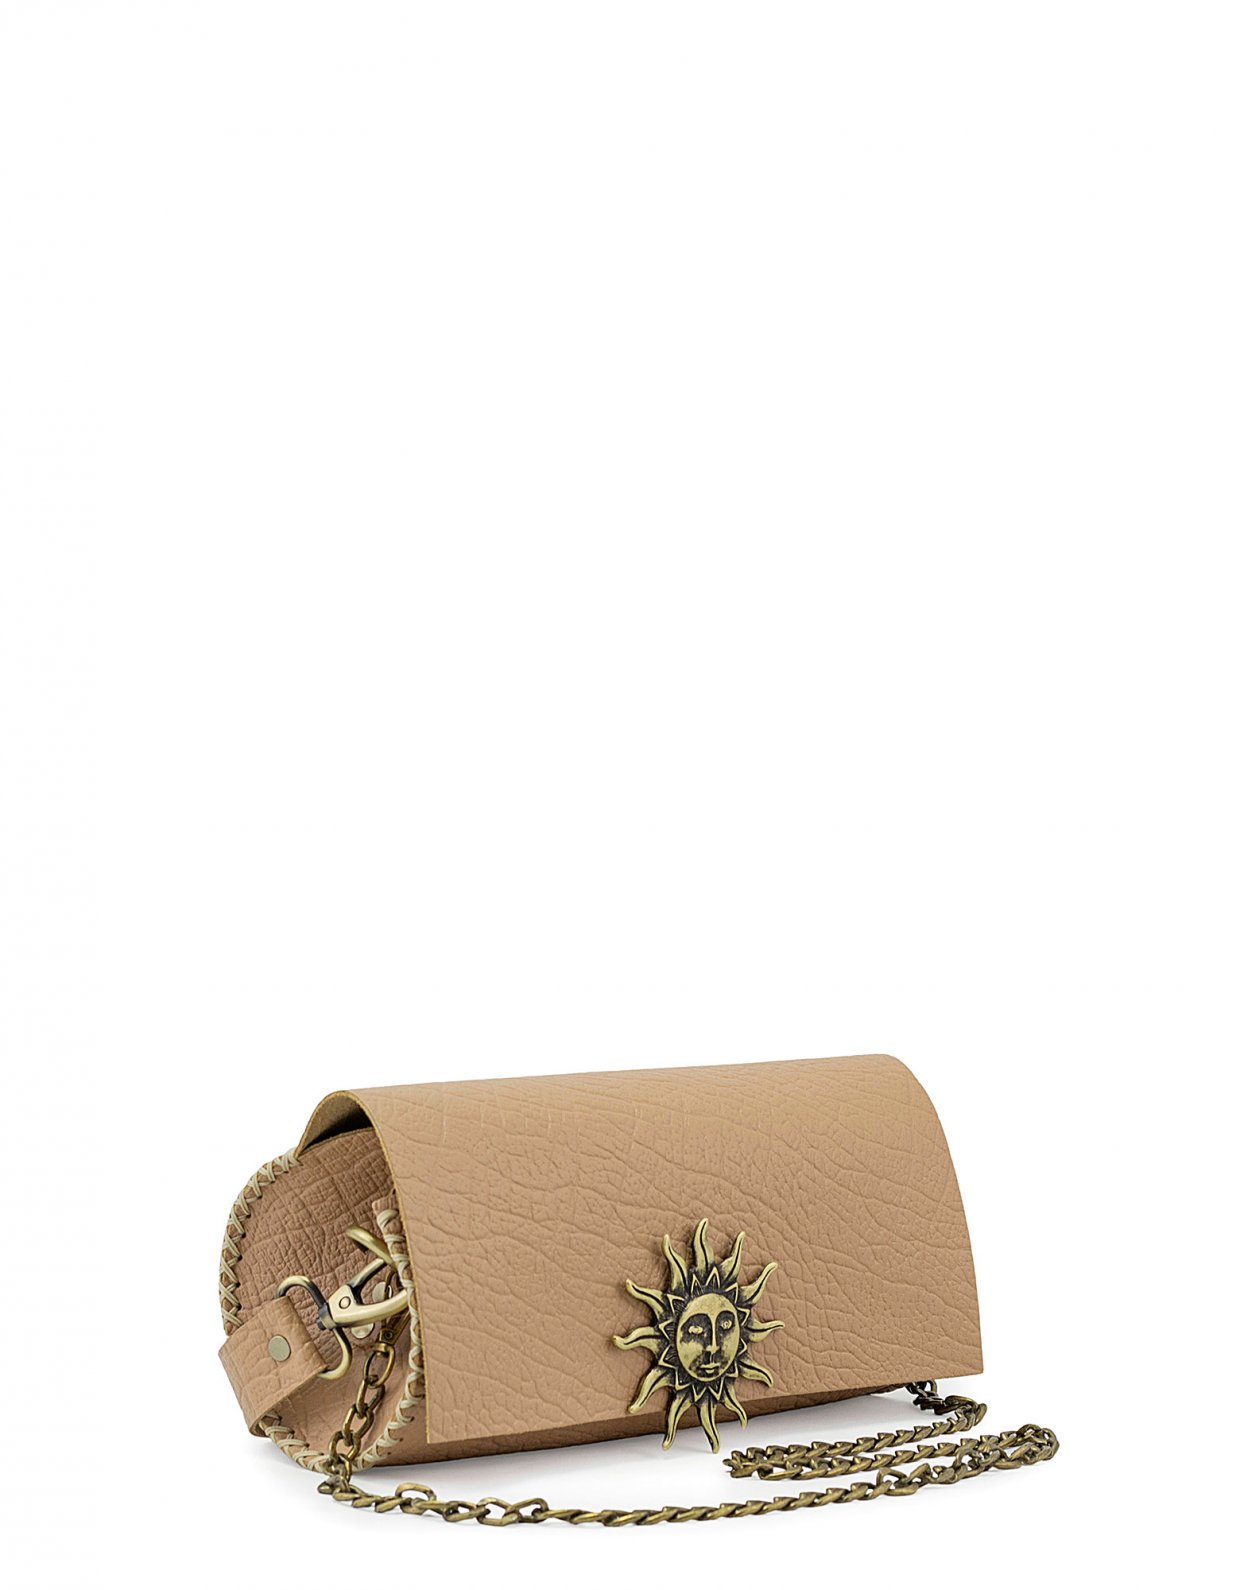 Individual Art Leather Believe barrel bag beige